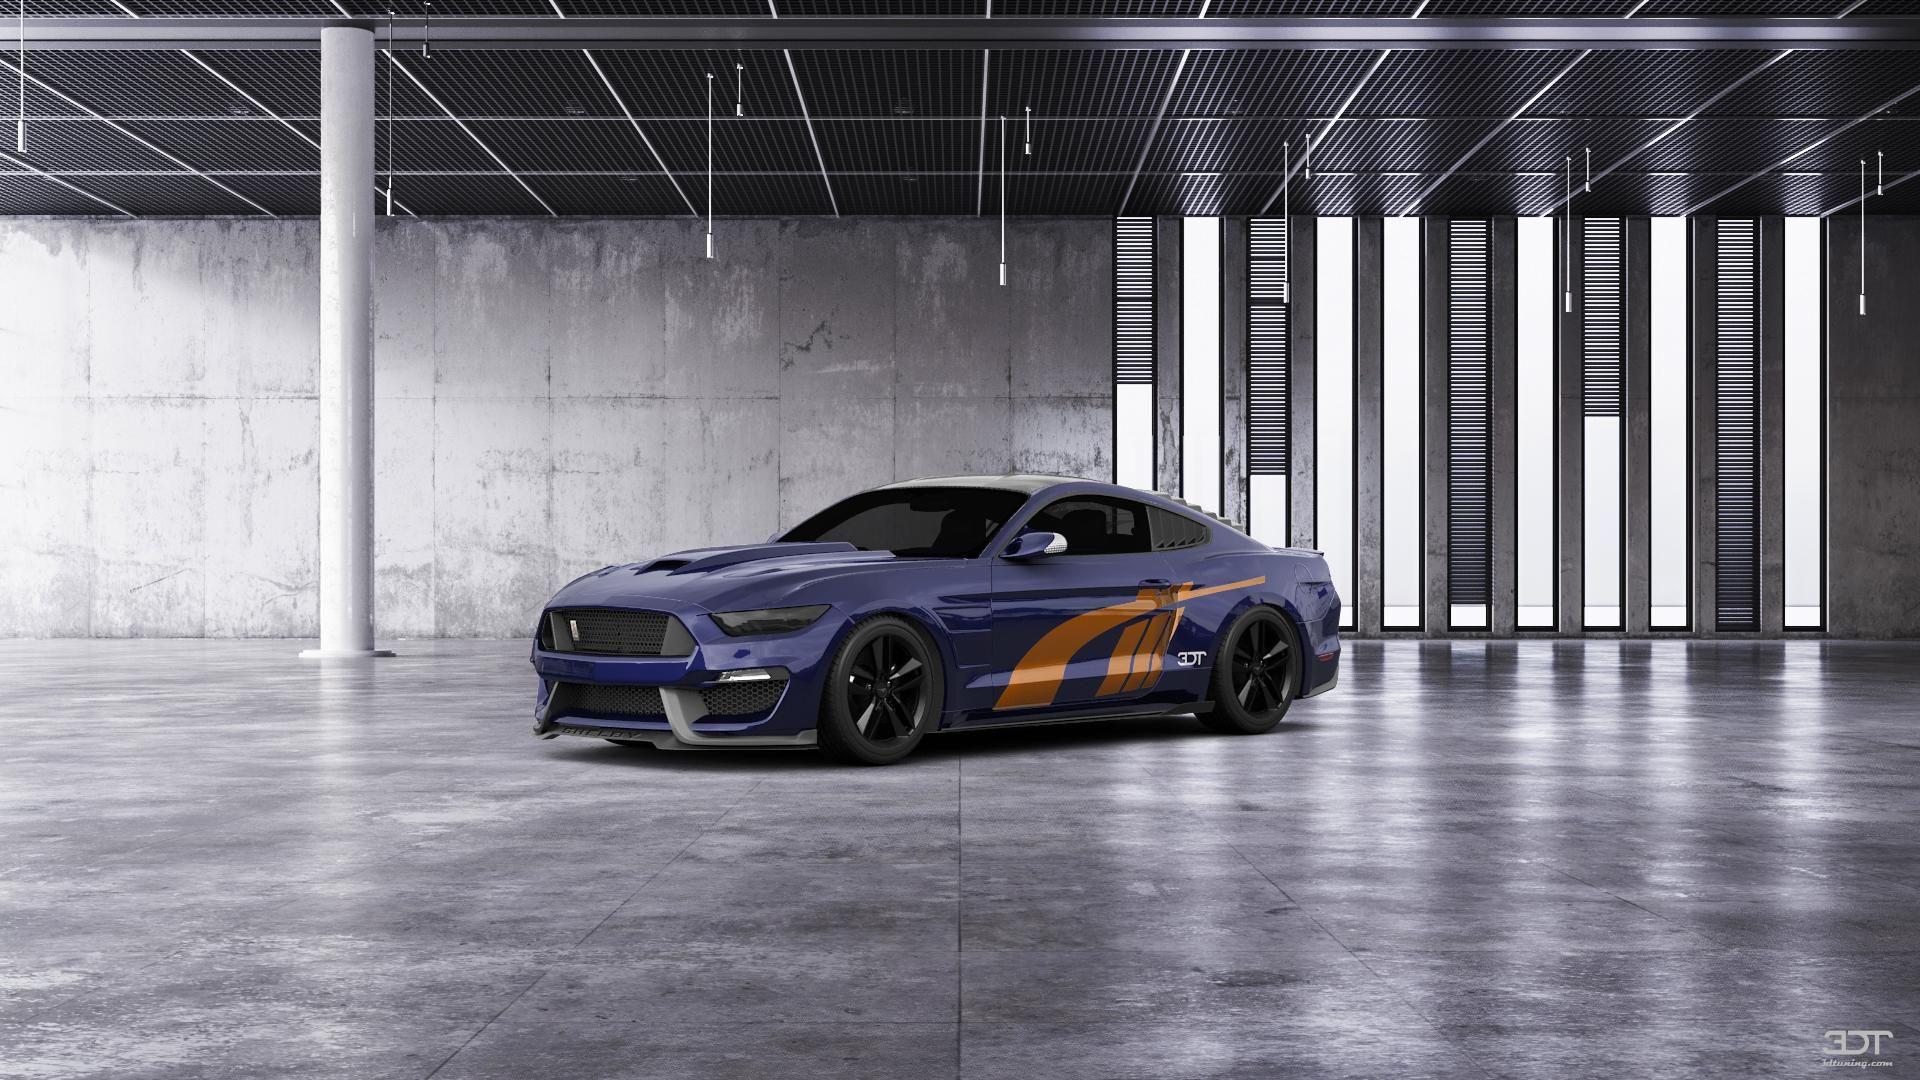 Checkout my tuning Mustang GT 2015 at 3DTuning 3dtuning tuning